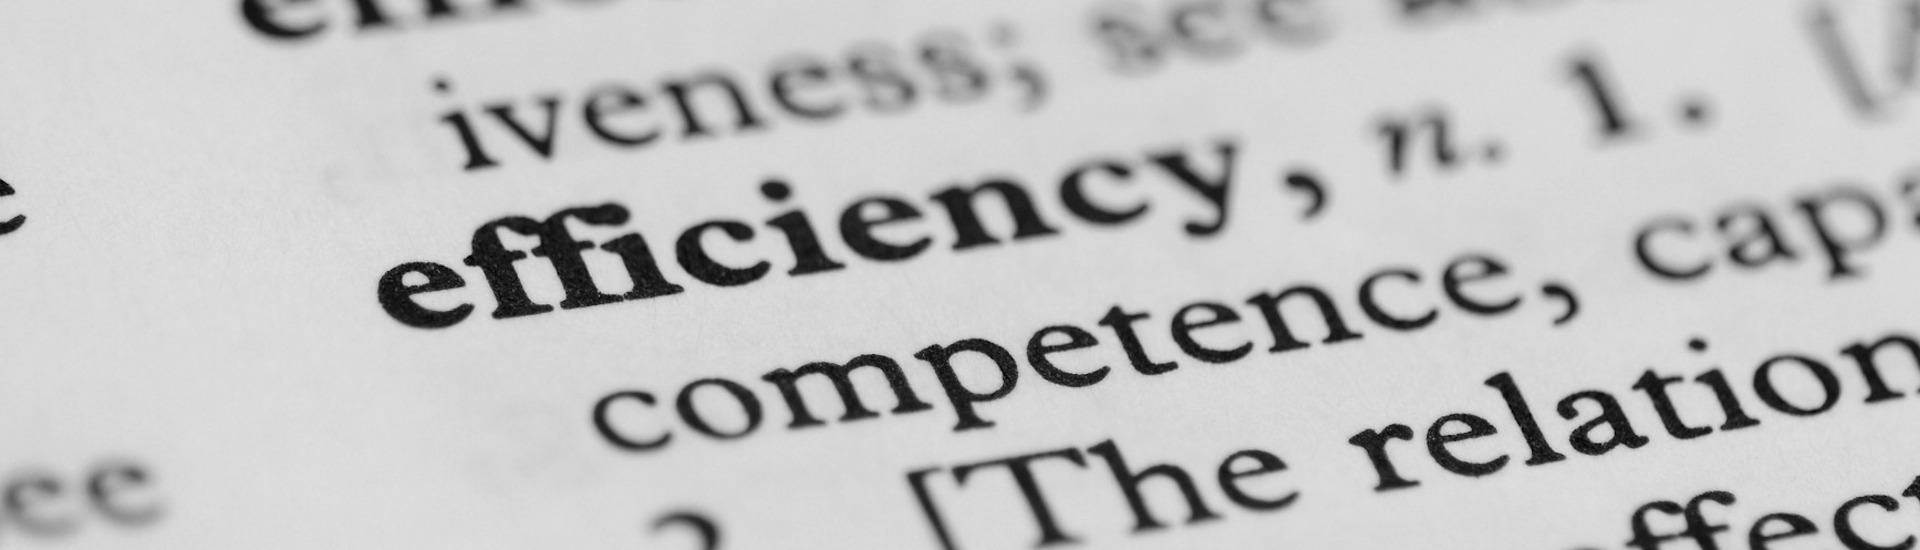 photodune-711019-dictionary-series-efficiency-m